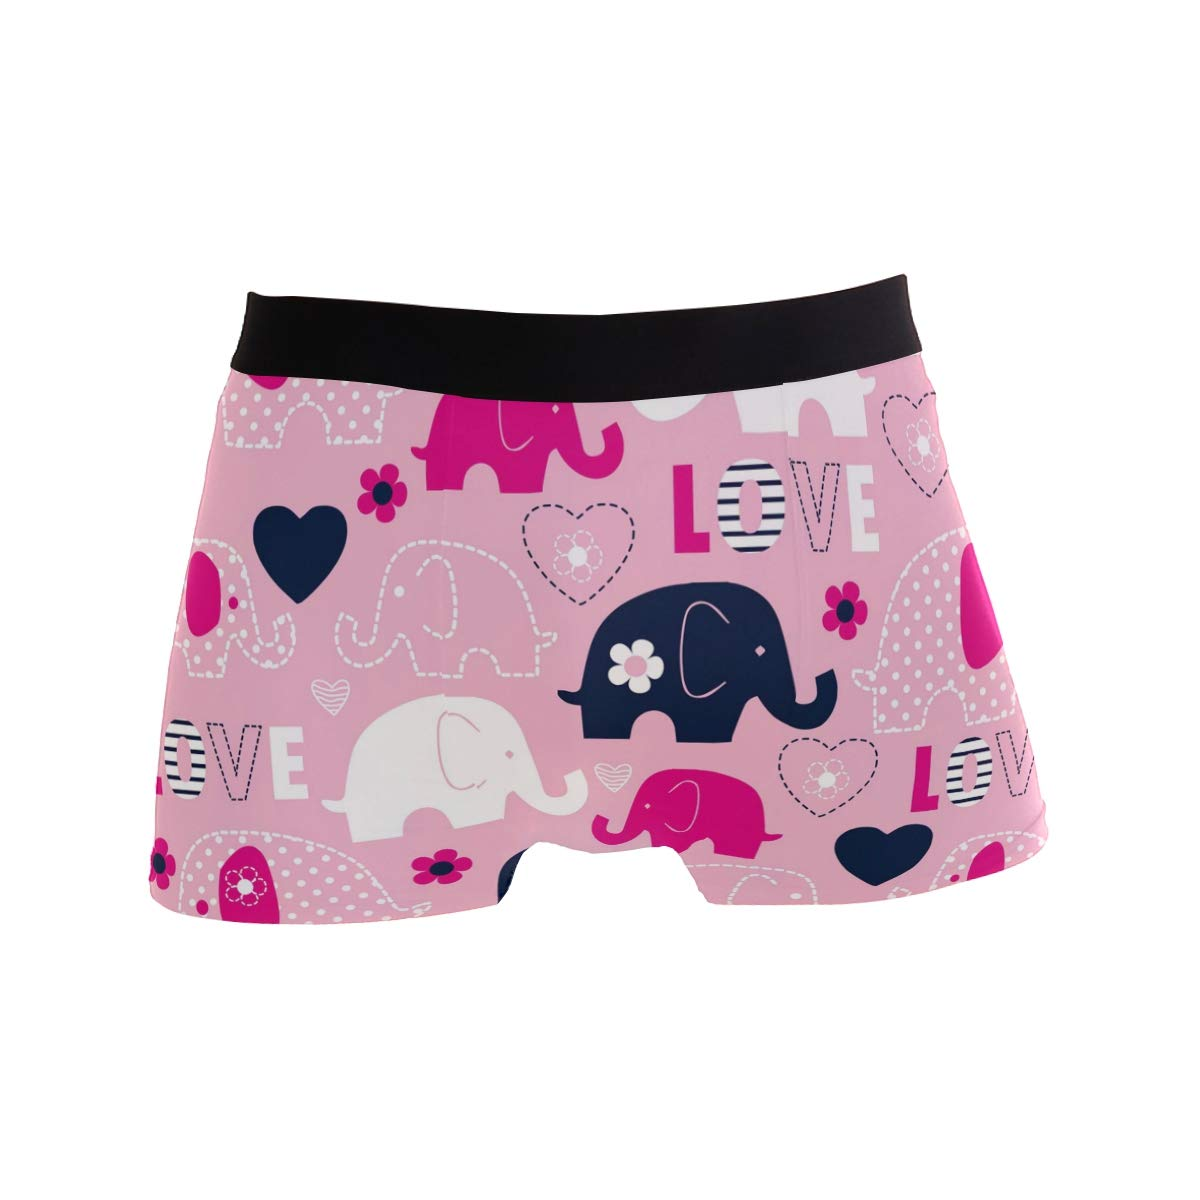 Cute Floral Elephant Love Heart Short Underwear Soft Stretch Underpants for Men Boys S-XL BETTKEN Mens Boxer Briefs